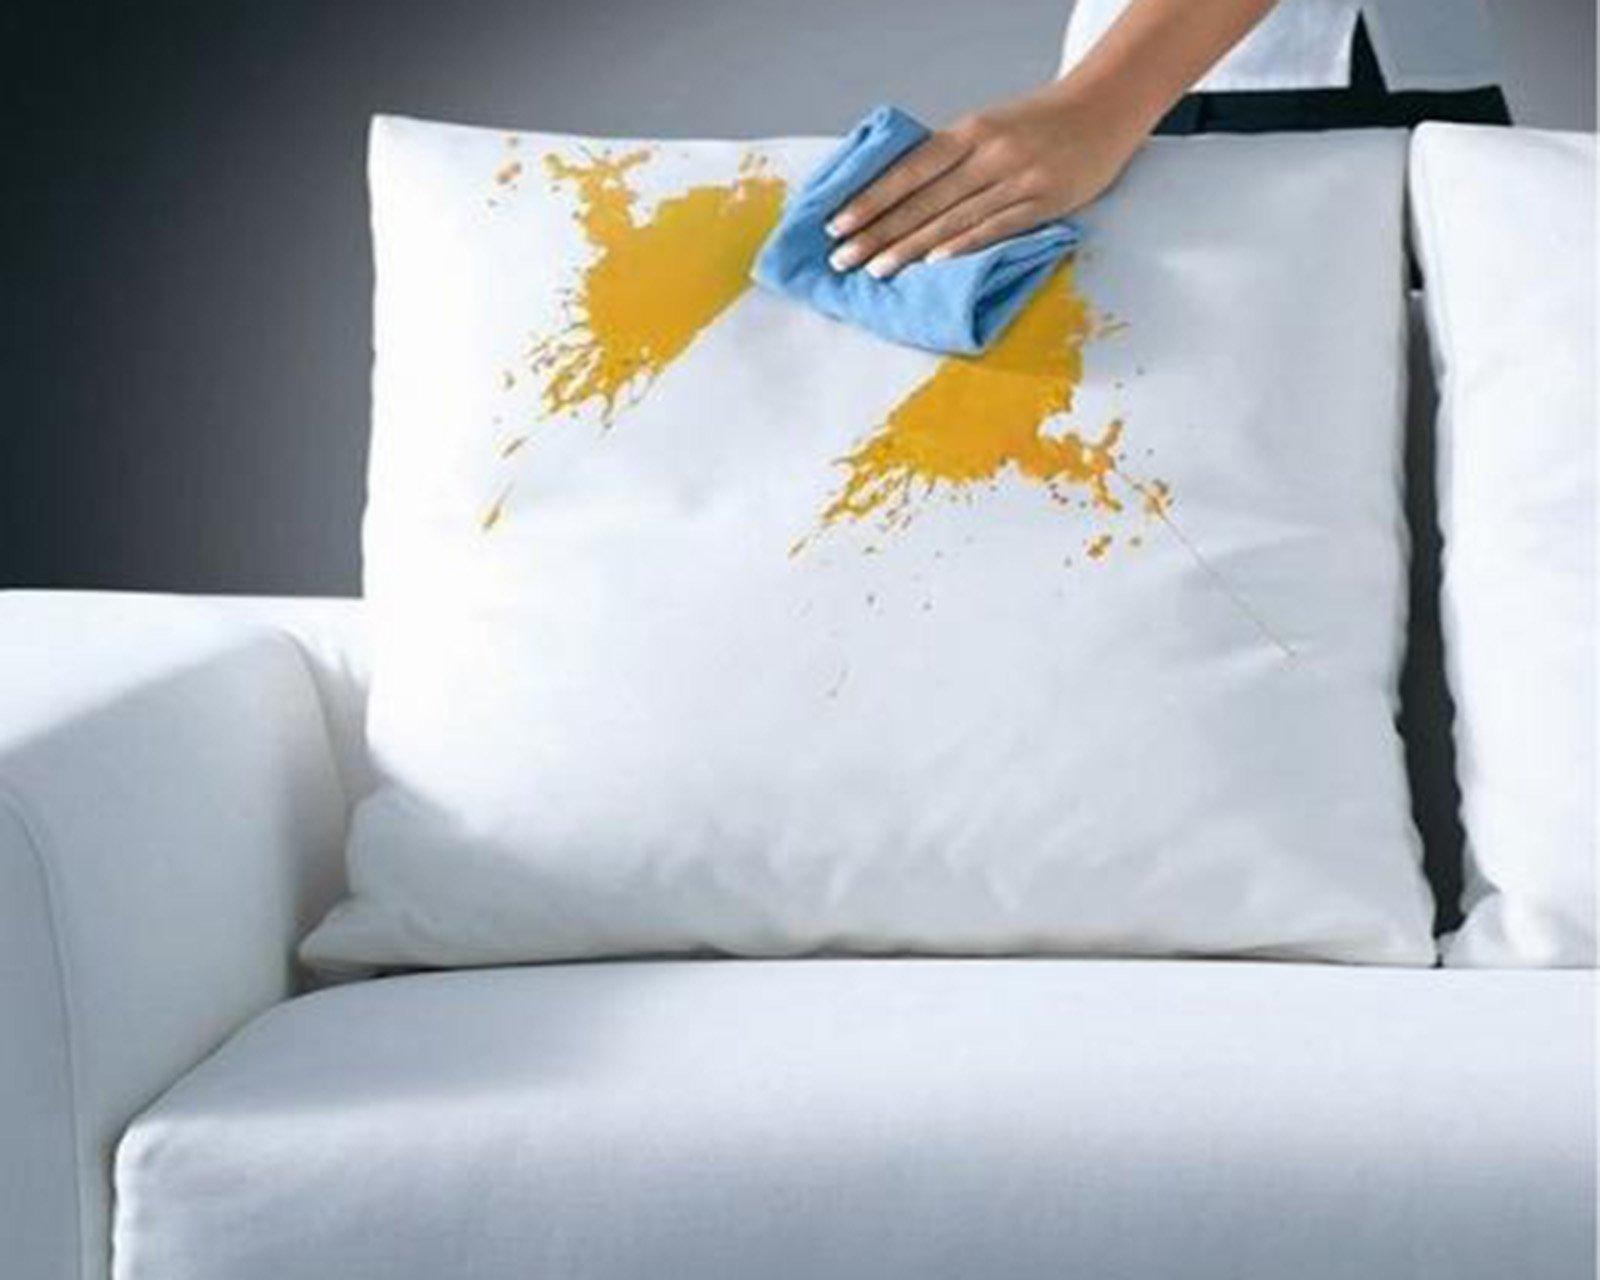 Tessuto per divani antimacchia m canisme chasse d 39 eau wc - Pulire divano microfibra ...